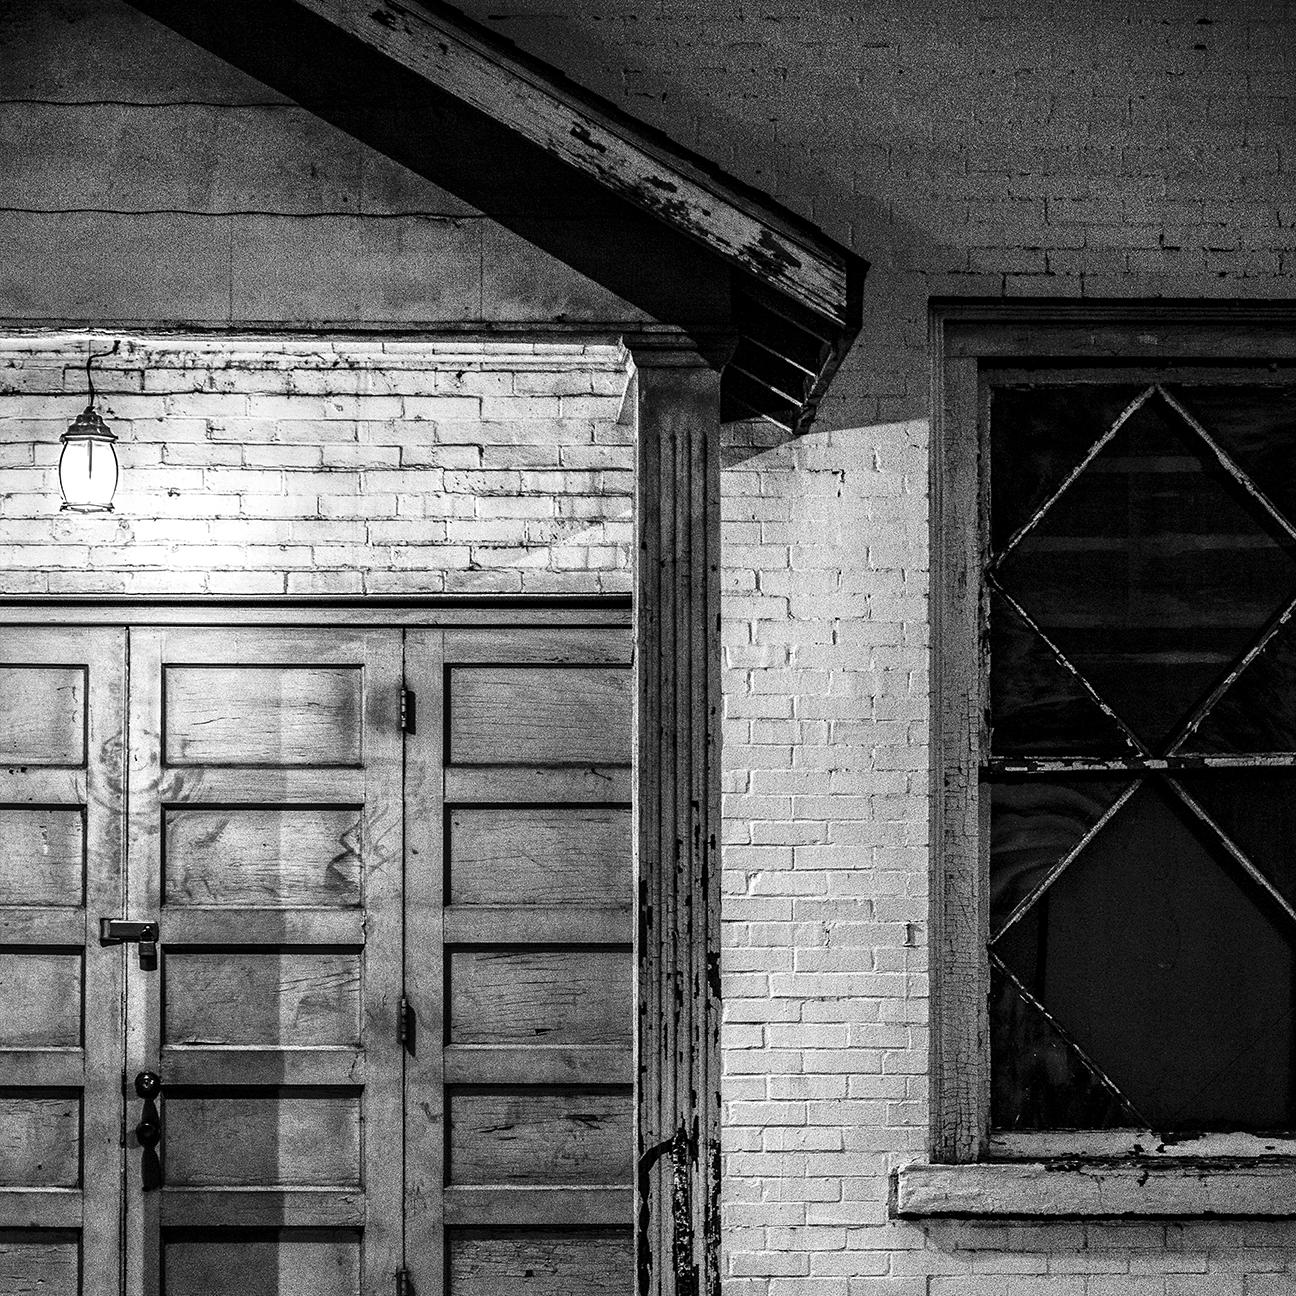 abandoned-church-rosa-parks-north-nashville-detail-SQUARE-1102